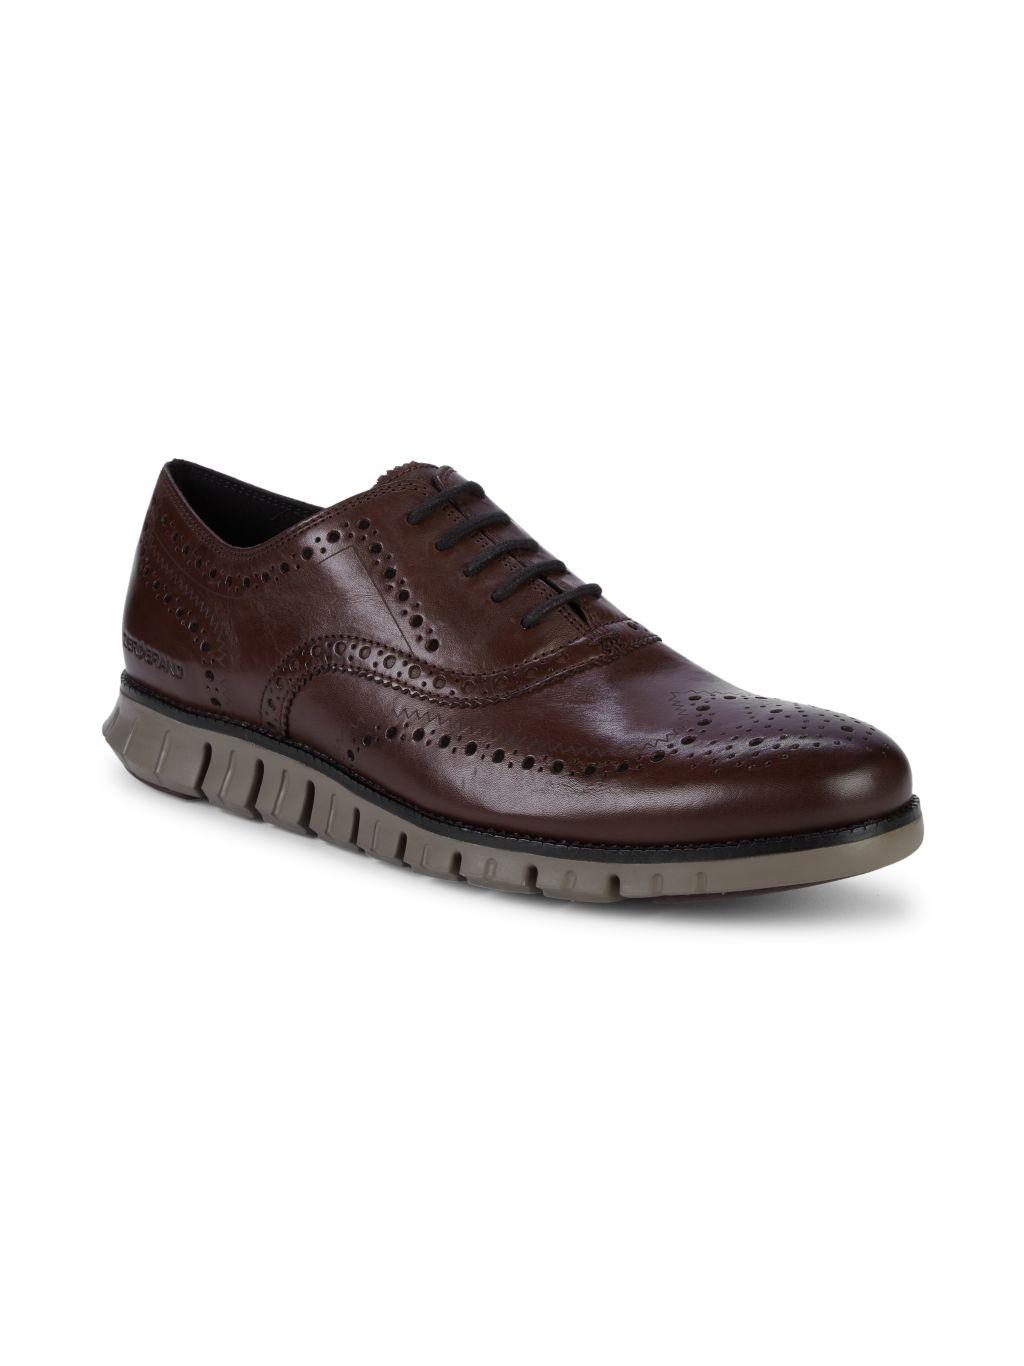 Cole Haan Zero Grand Leather Wingtip Oxfords